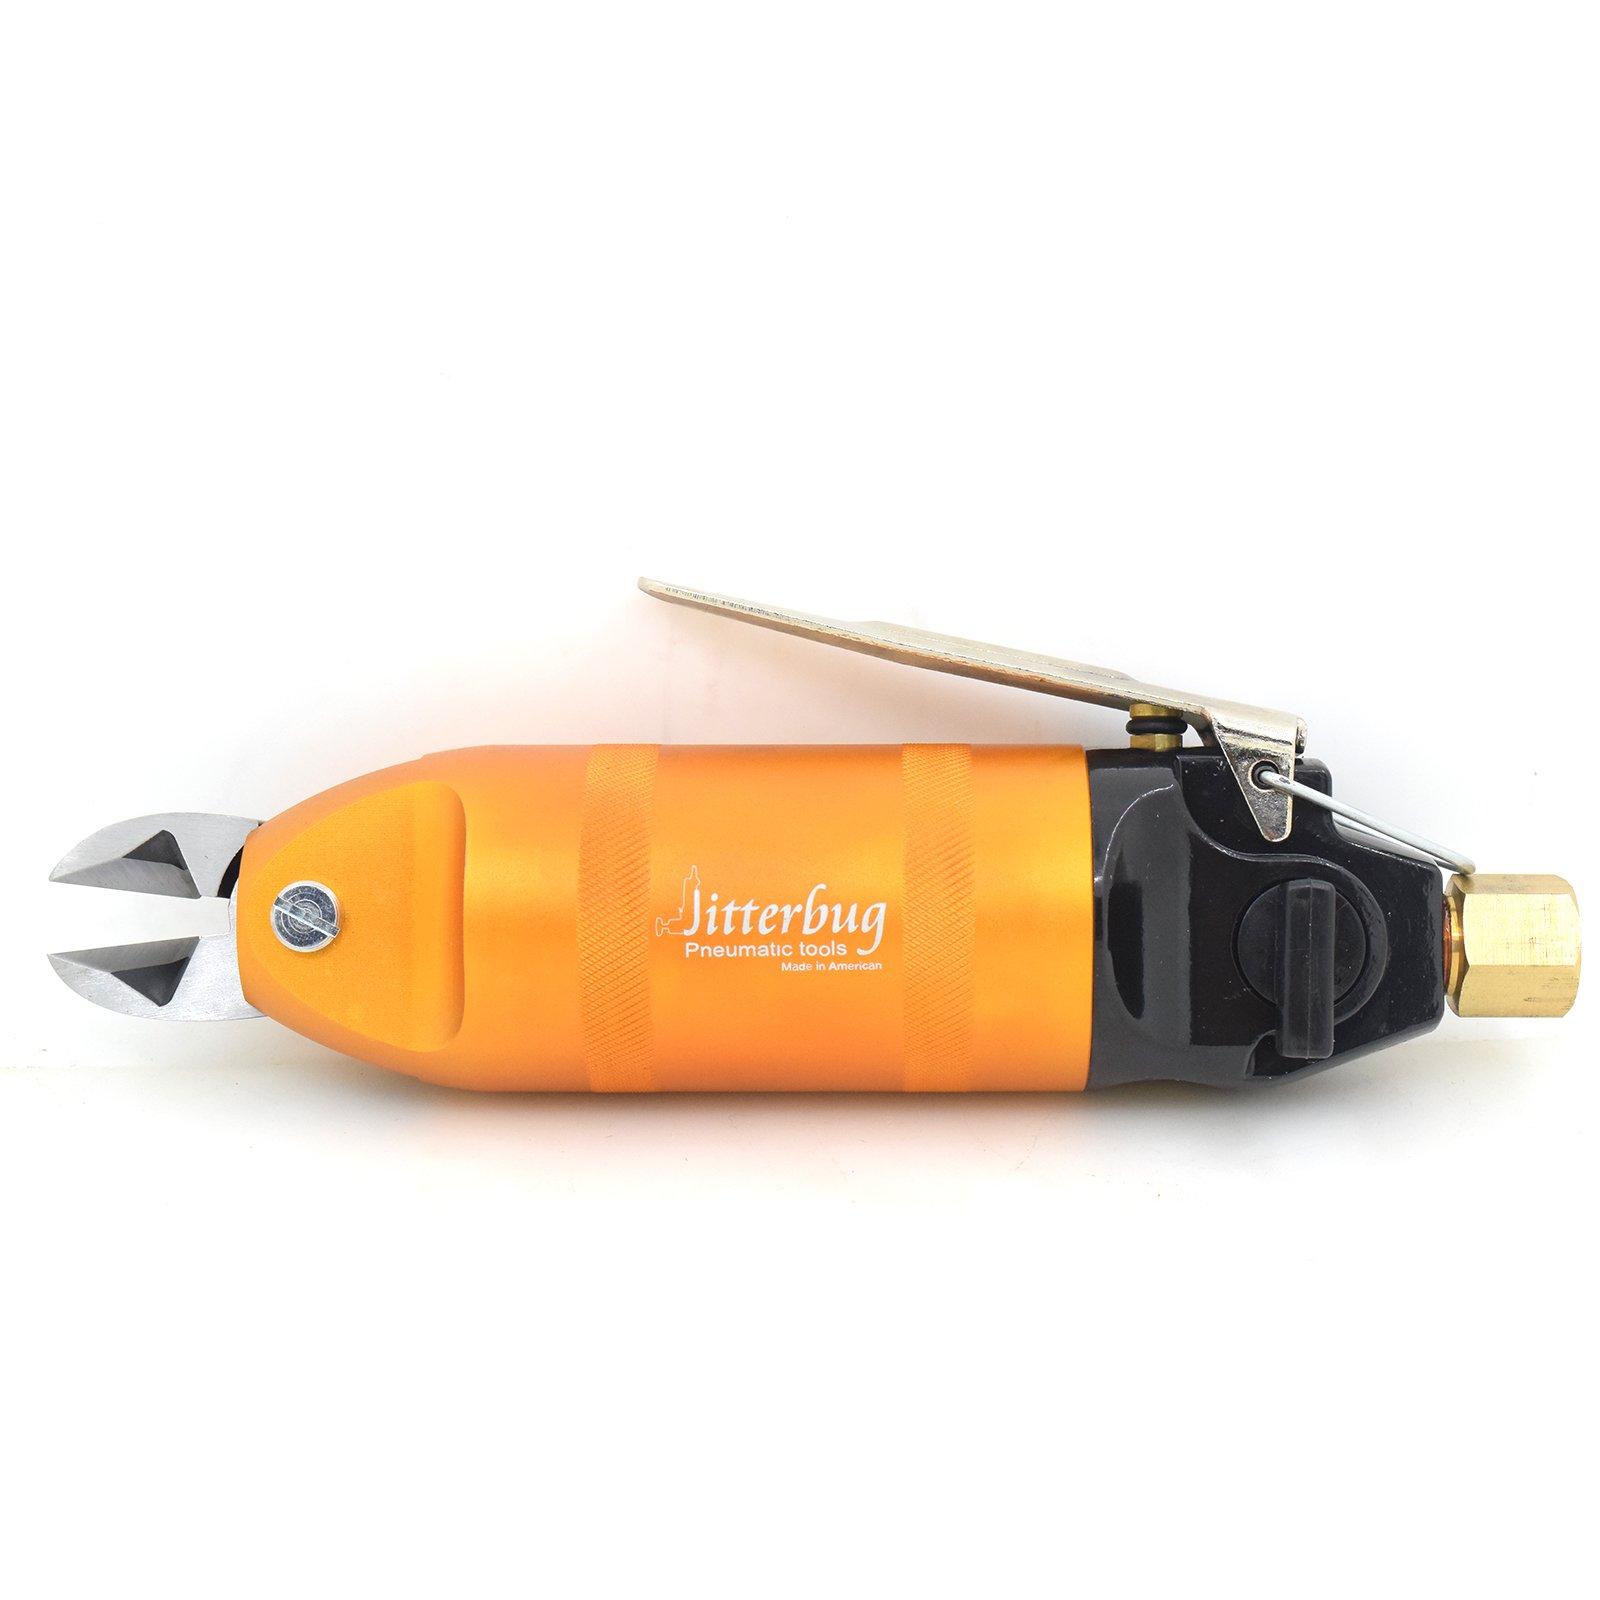 Pneumatic Air Crimping Pliers 2.0mm Iron Wire Shear Clamp Air Nipper HS-20 S5 Blade 14 Gauge Air Shear Cutter Tools by Jitterbug